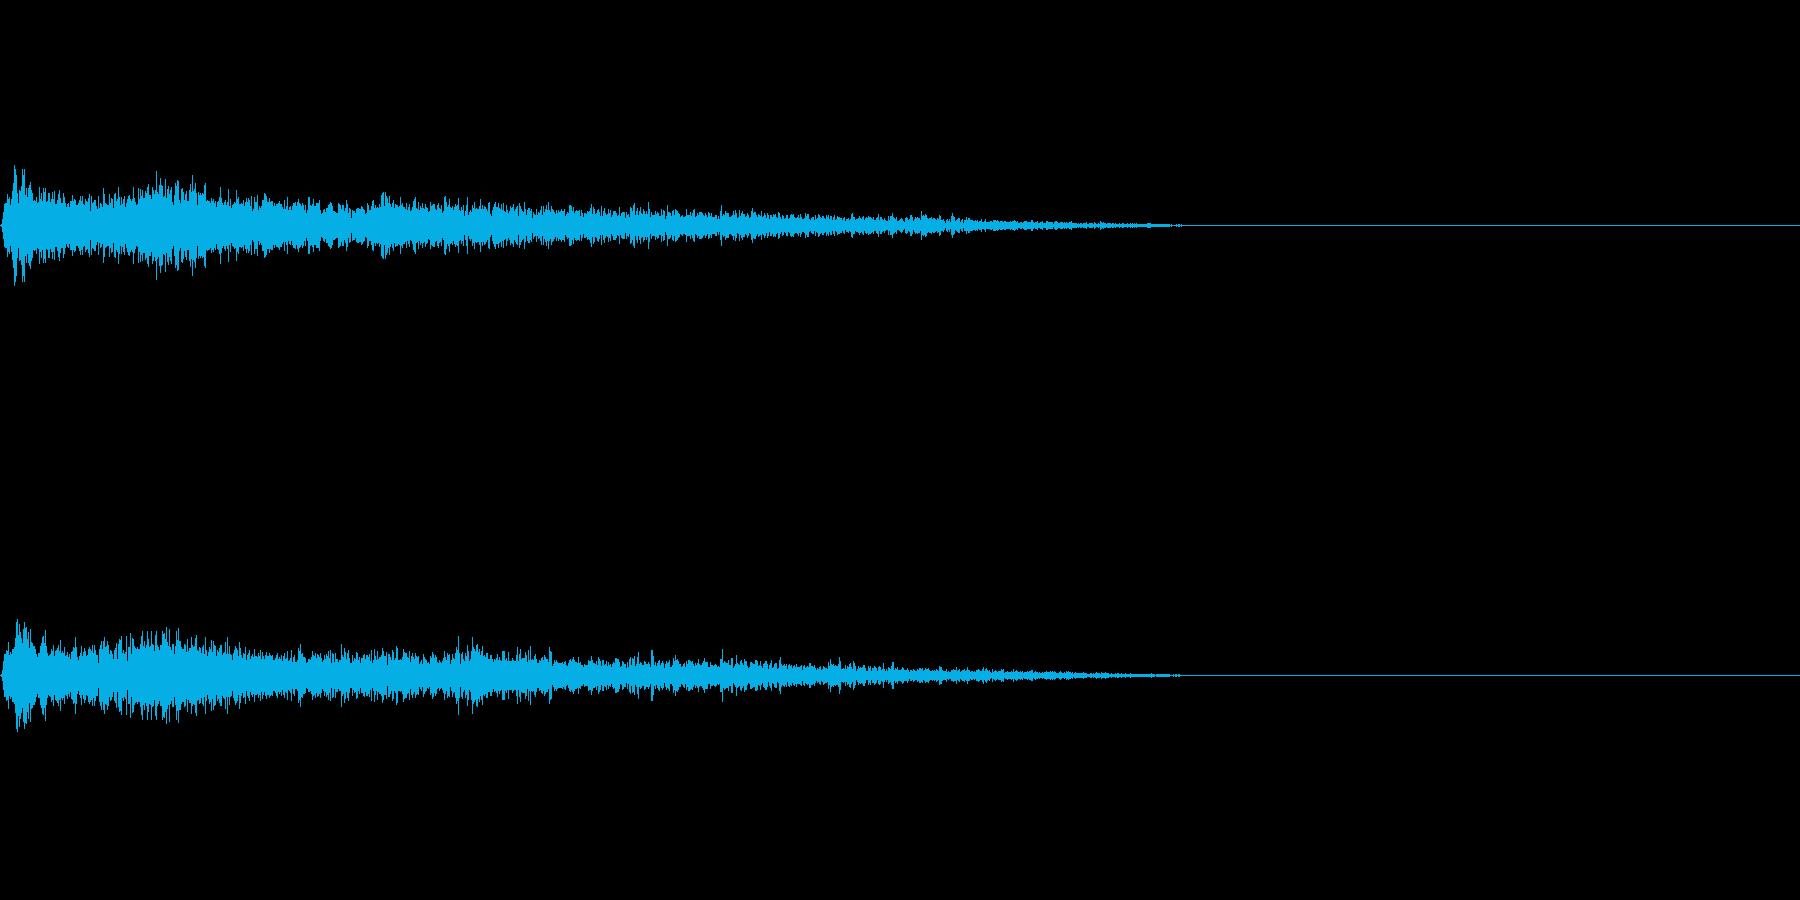 Eマイナーインパクト音 衝撃音の再生済みの波形